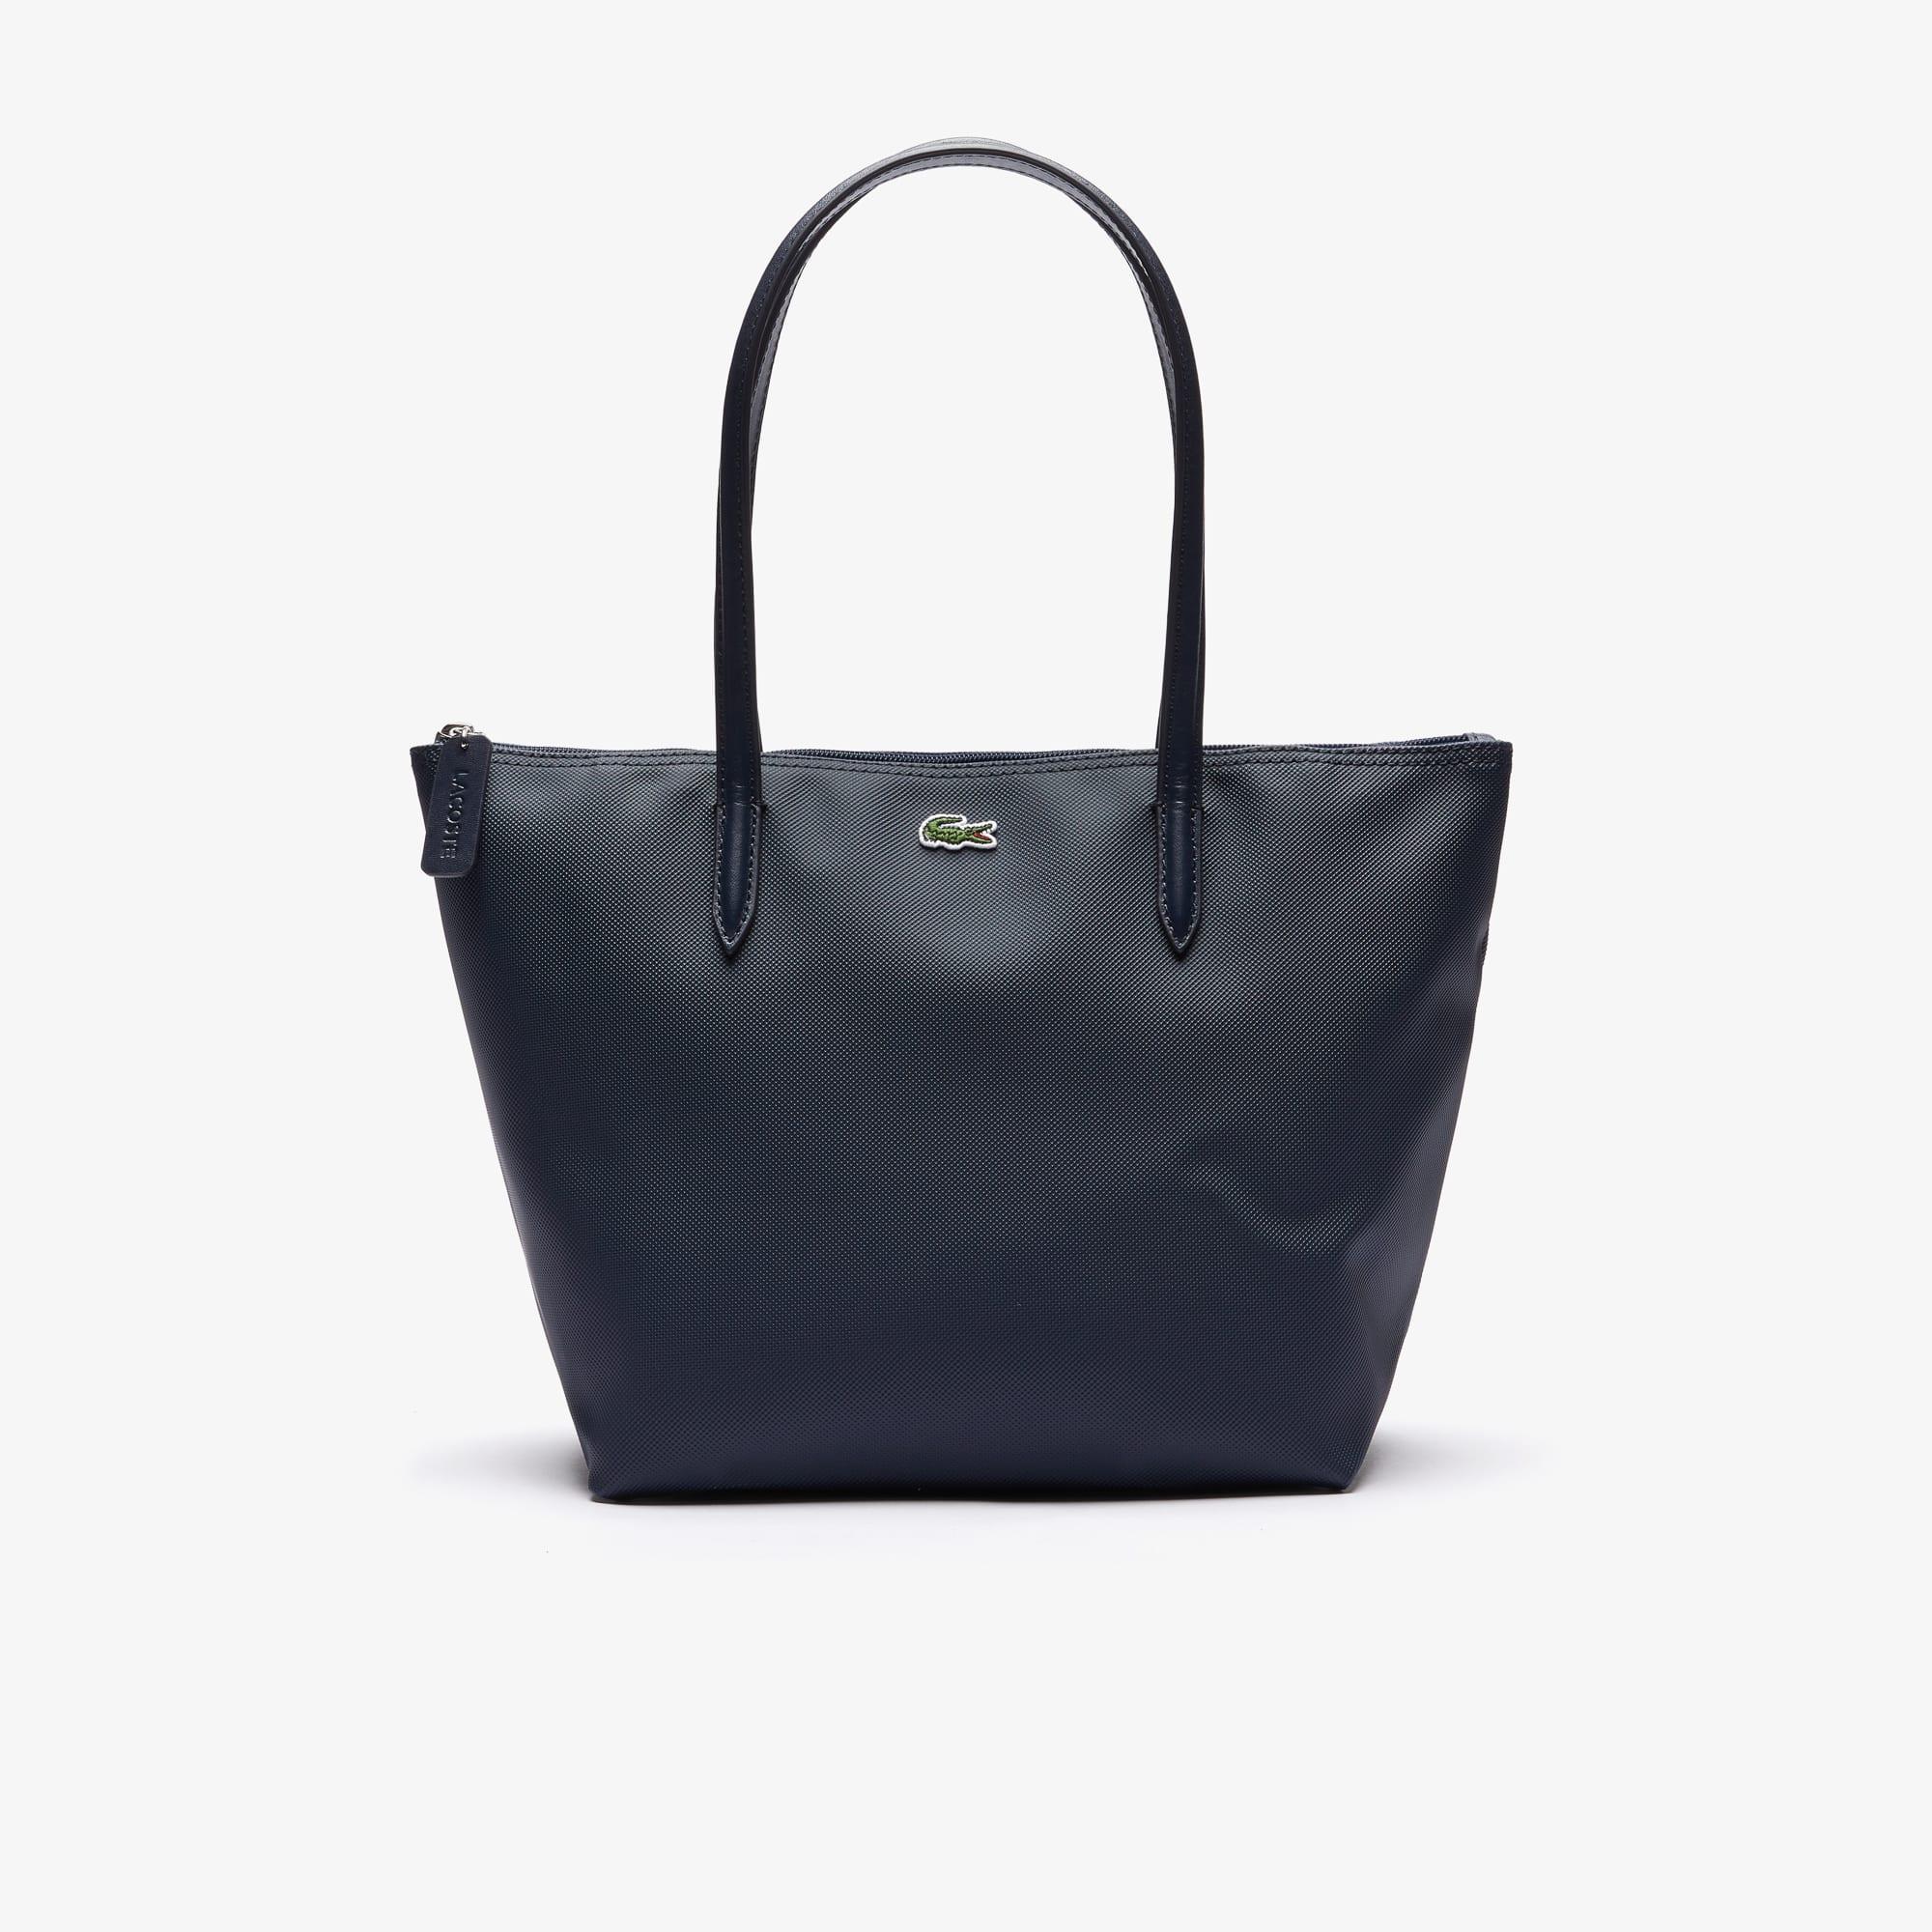 sacs main cuir sacs cabas maroquinerie femme lacoste. Black Bedroom Furniture Sets. Home Design Ideas